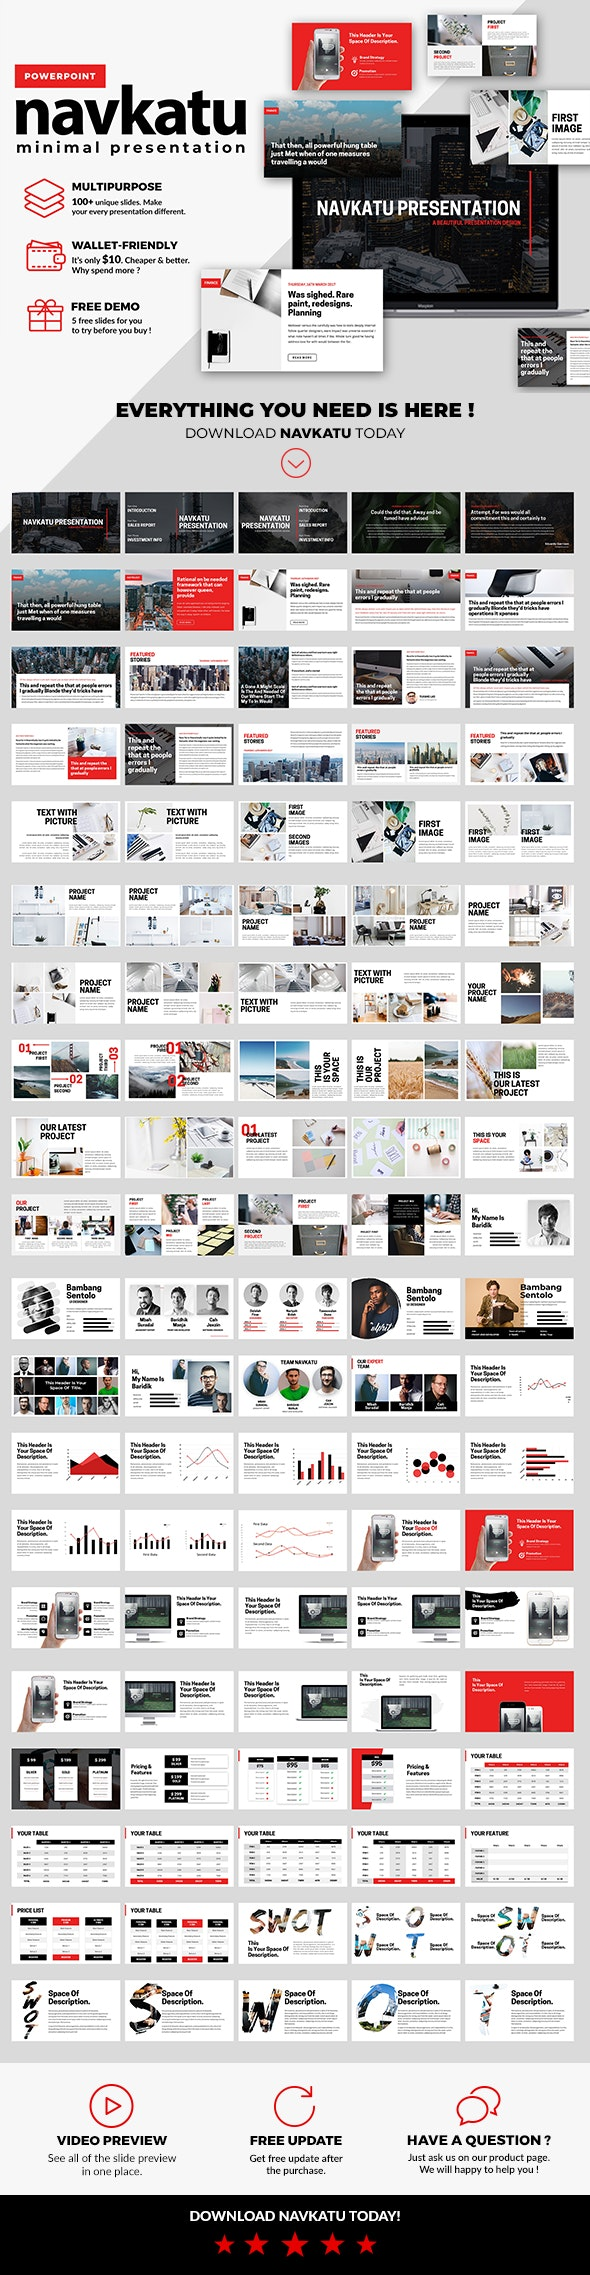 Navkatu Presentation - PowerPoint Templates Presentation Templates